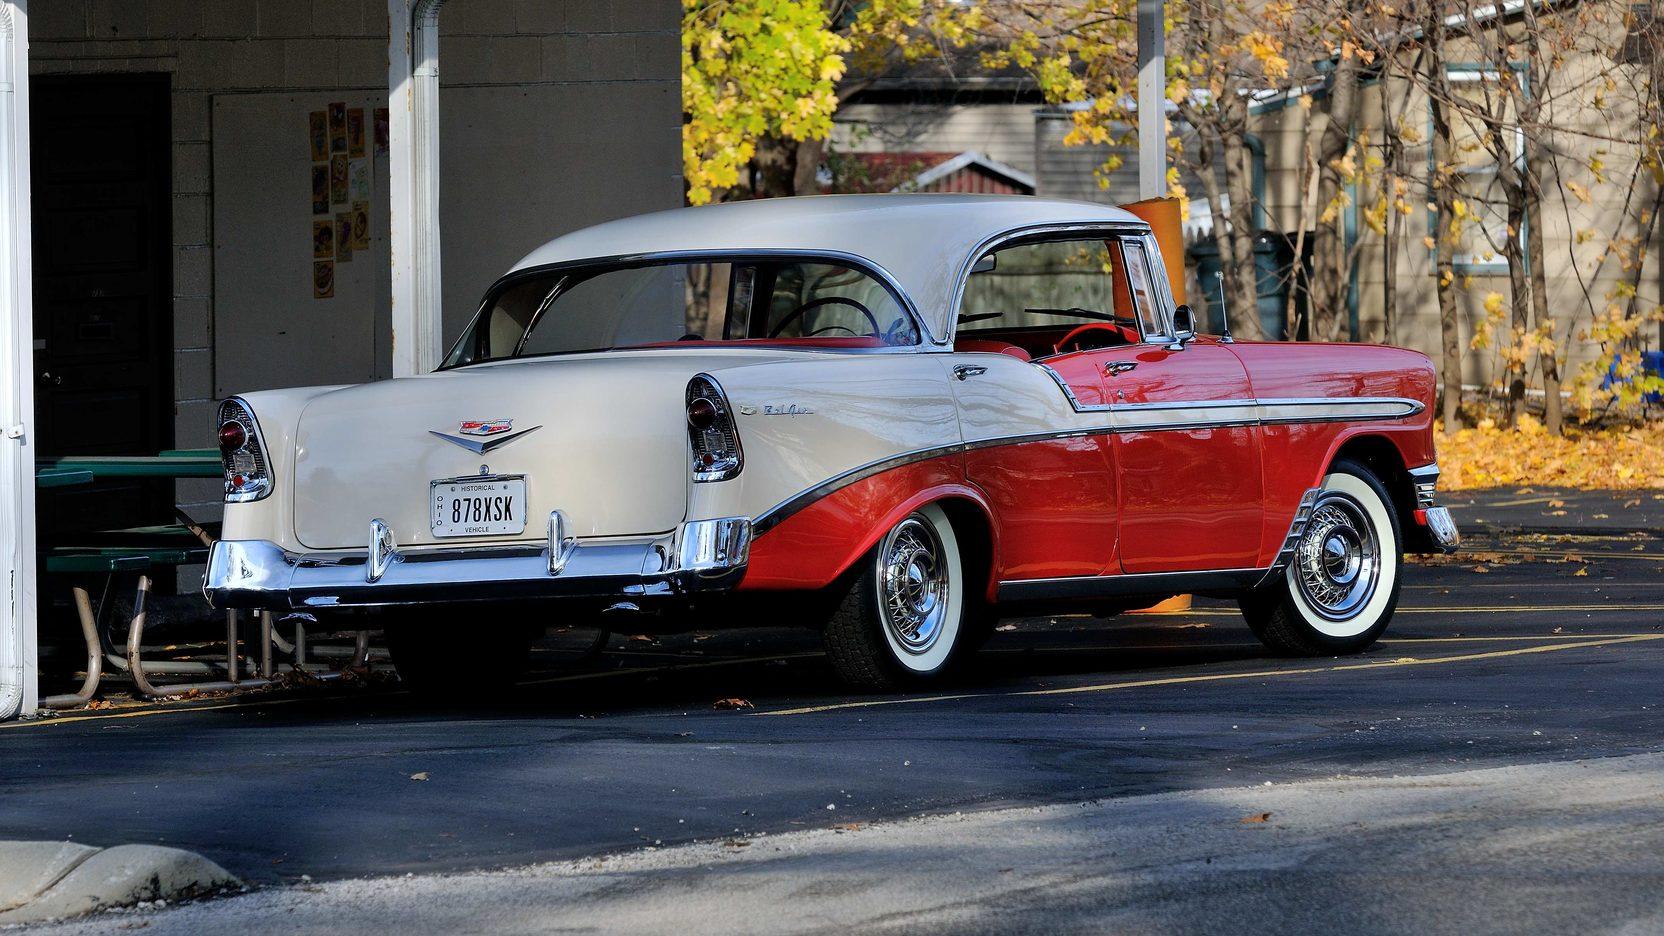 1957 Cars Restored Or Wallpapers 1956 Chevrolet Bel Air 4 Door Hardtop 265 Ci Automatic